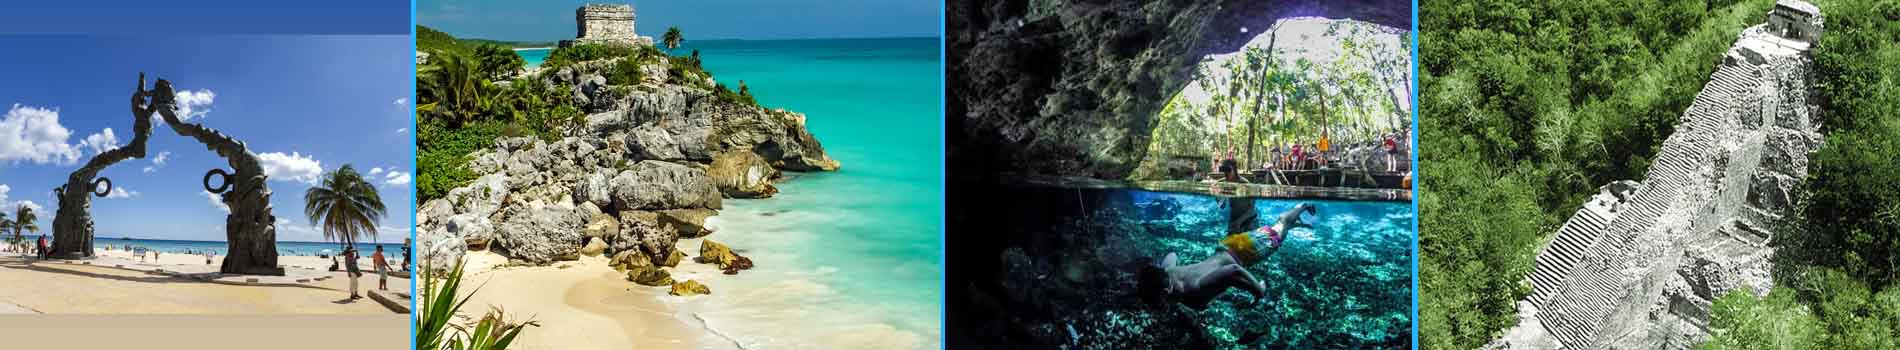 Tour a Tulum Coba desde Cancun